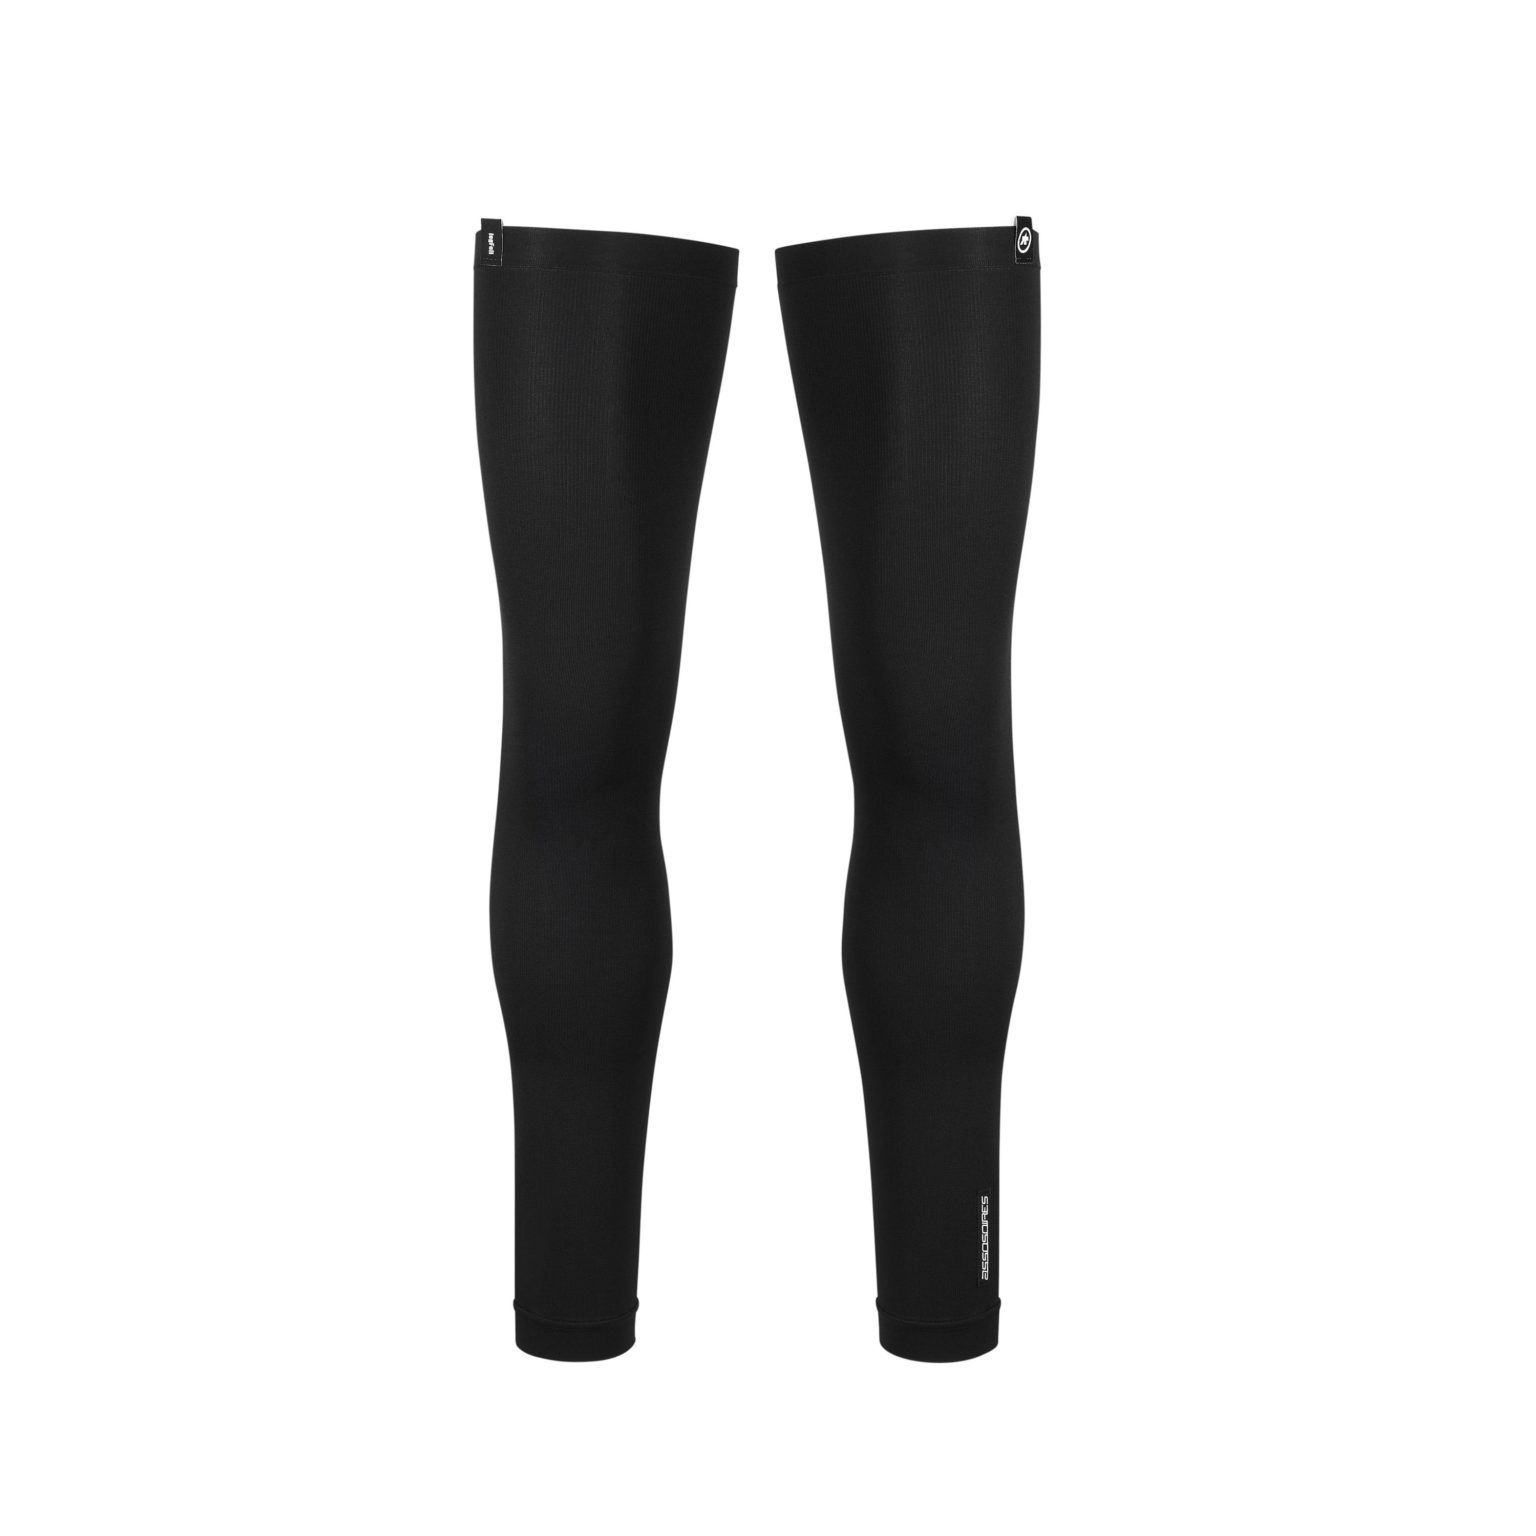 ASSOSOIRES Leg Foil blackSeries 1 F Fotor